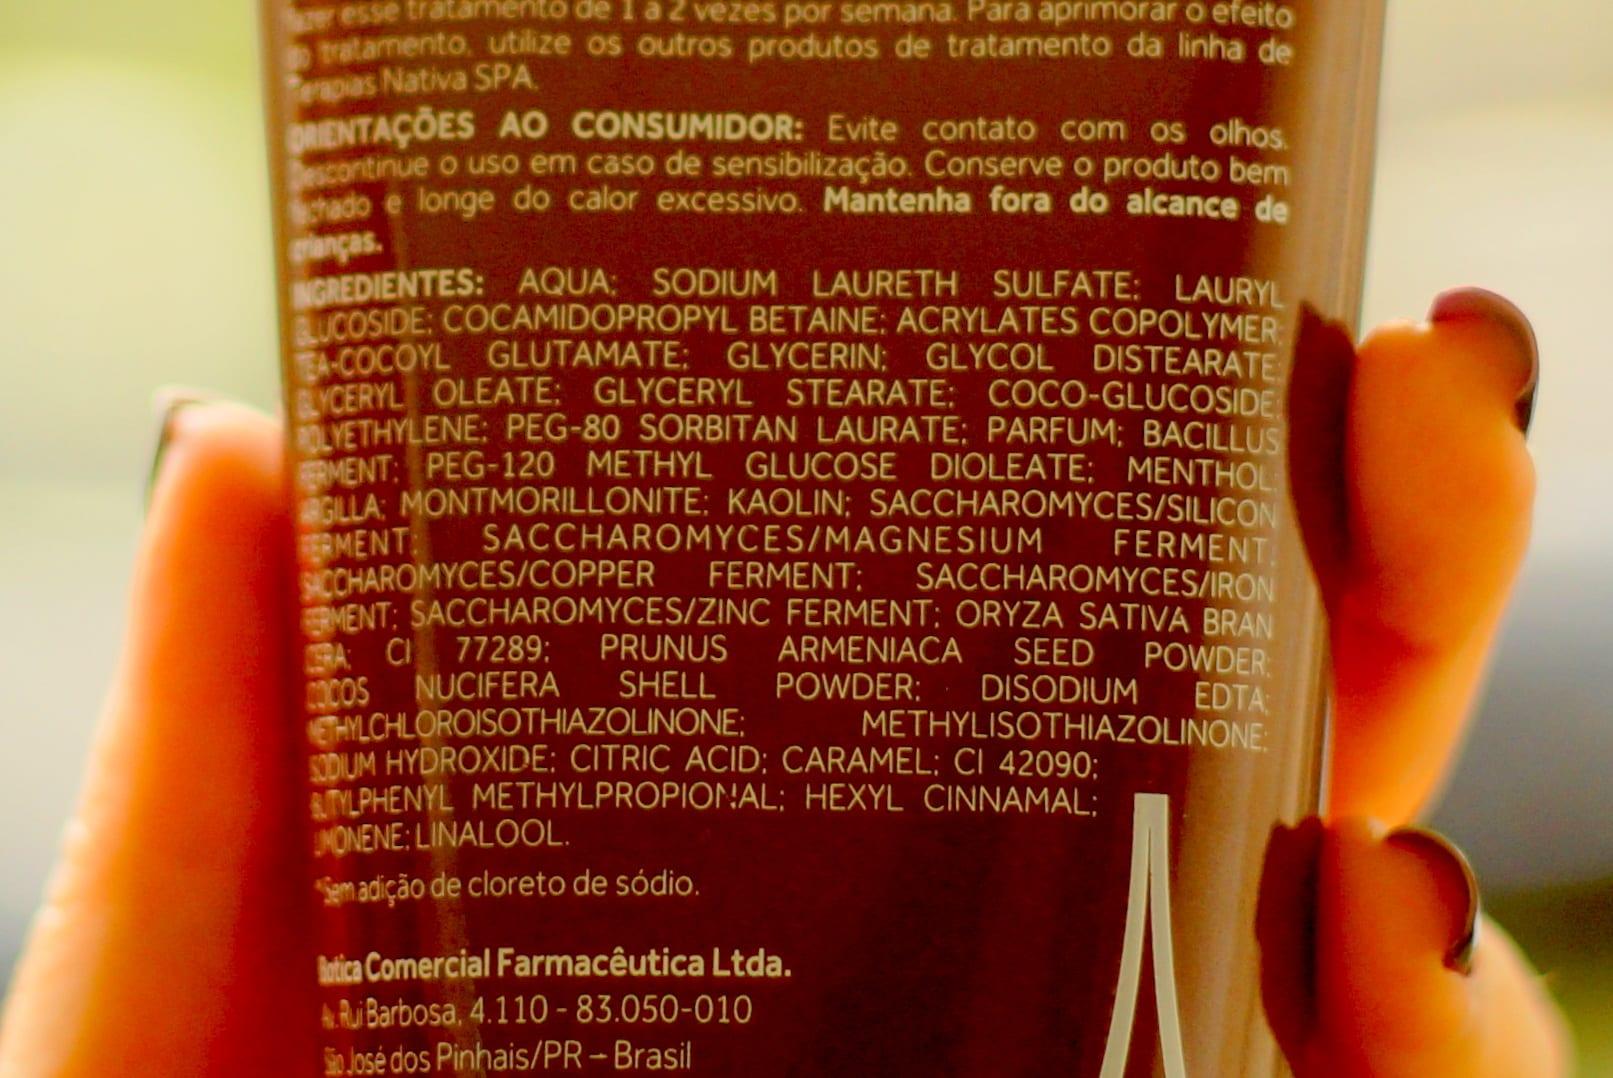 Pré-shampoo Purificante Argiloterapia Nativa Spa